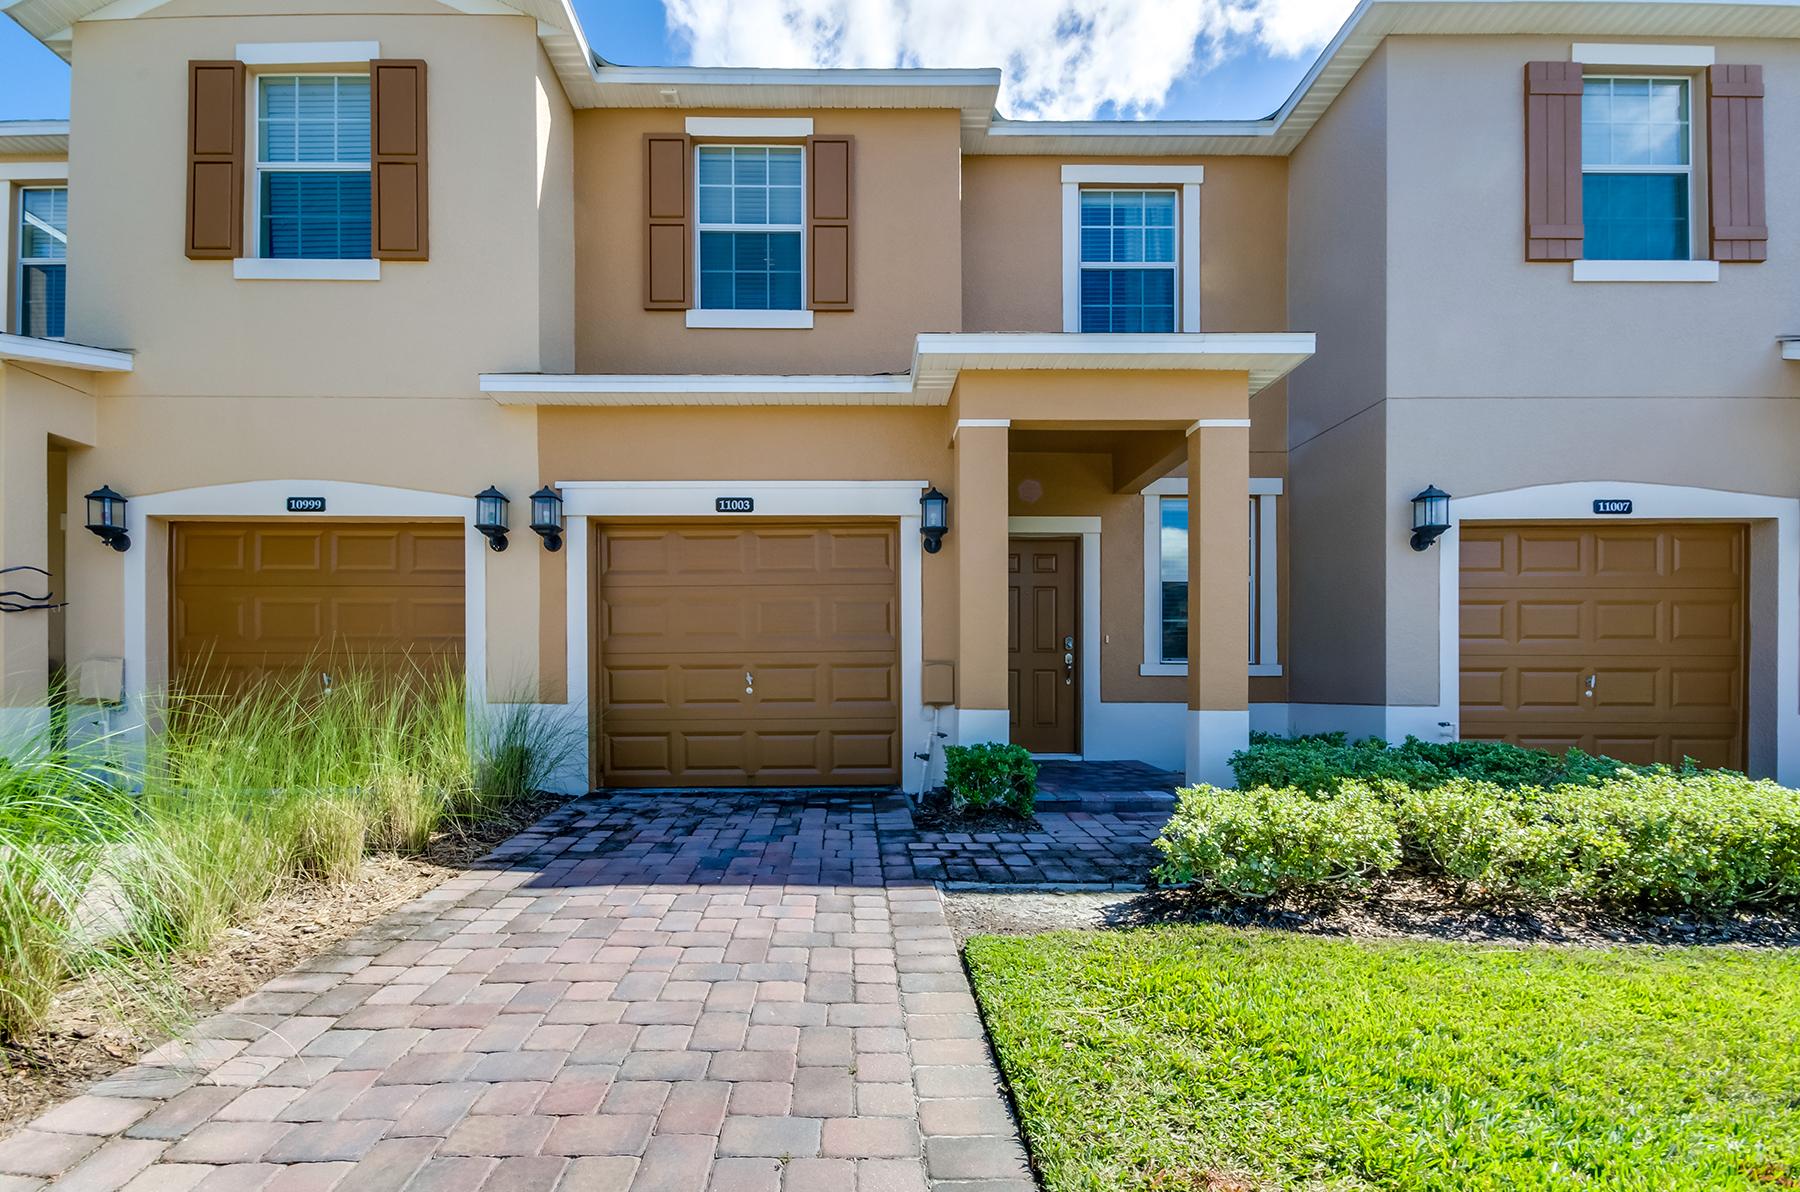 Nhà phố vì Bán tại ORLANDO 11003 Savannah Landing Cir Orlando, Florida, 32832 Hoa Kỳ